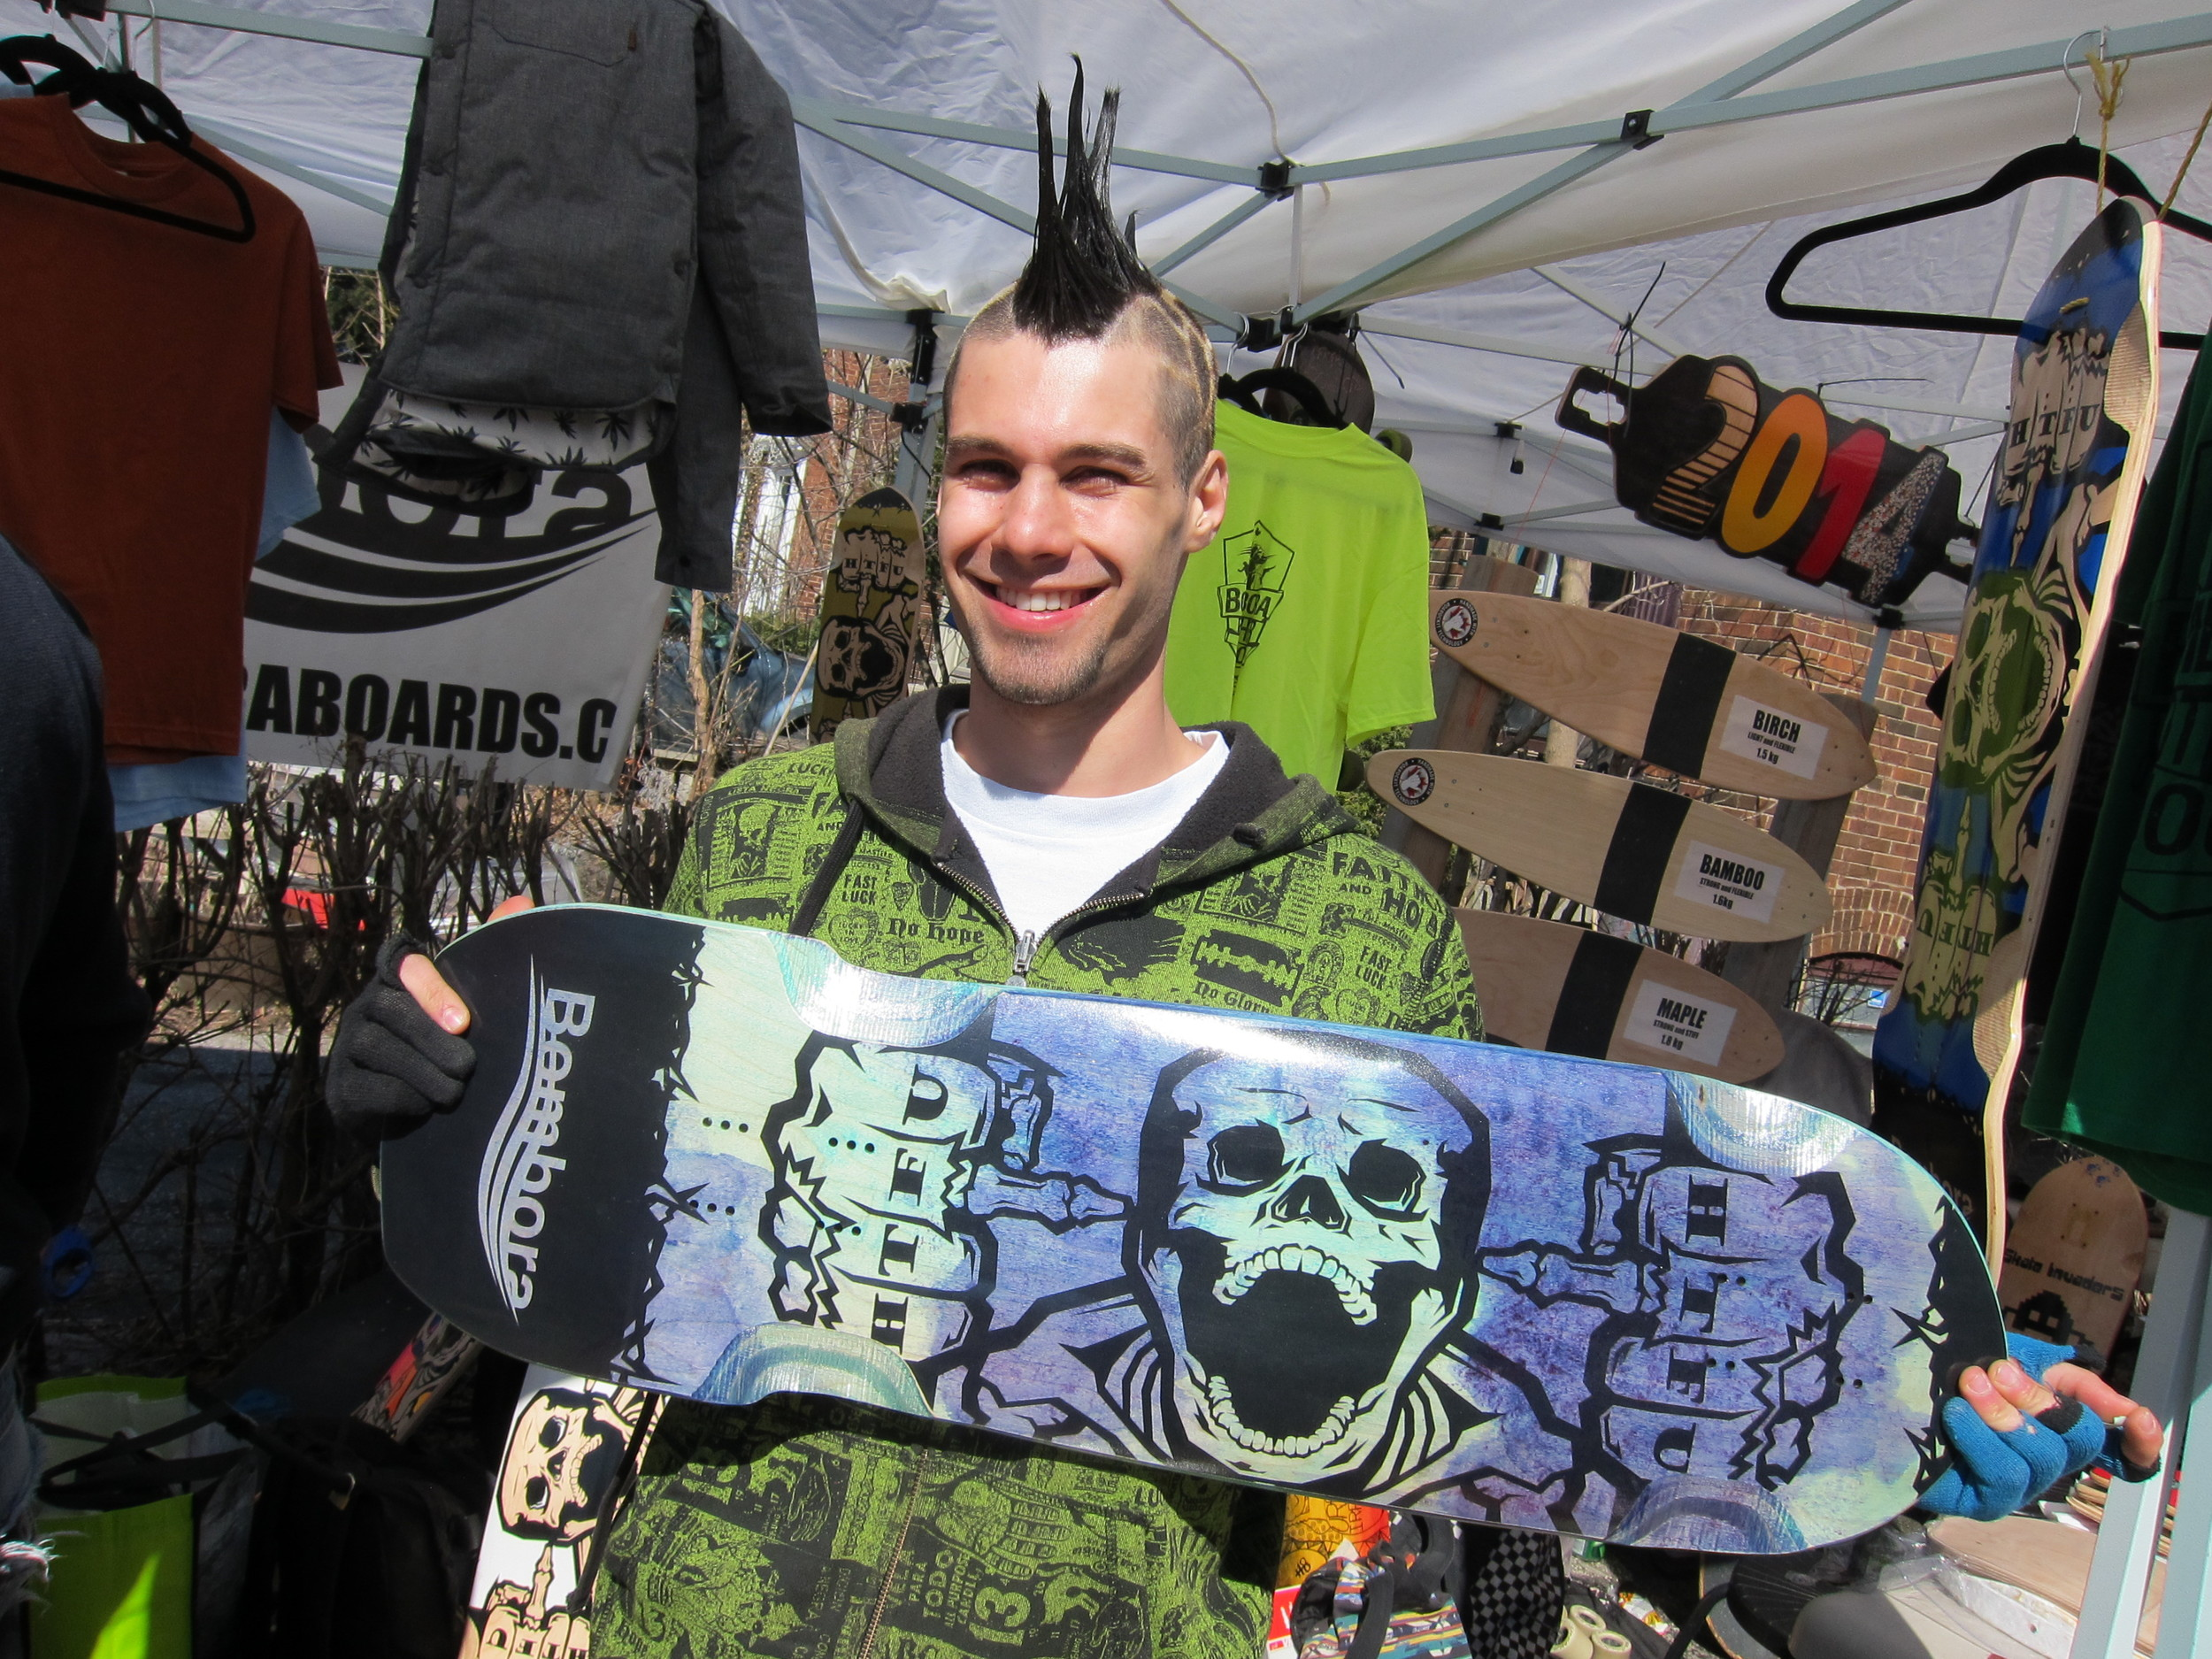 Brad, loving his new Bombora Board. Photo - Ponyta 2014